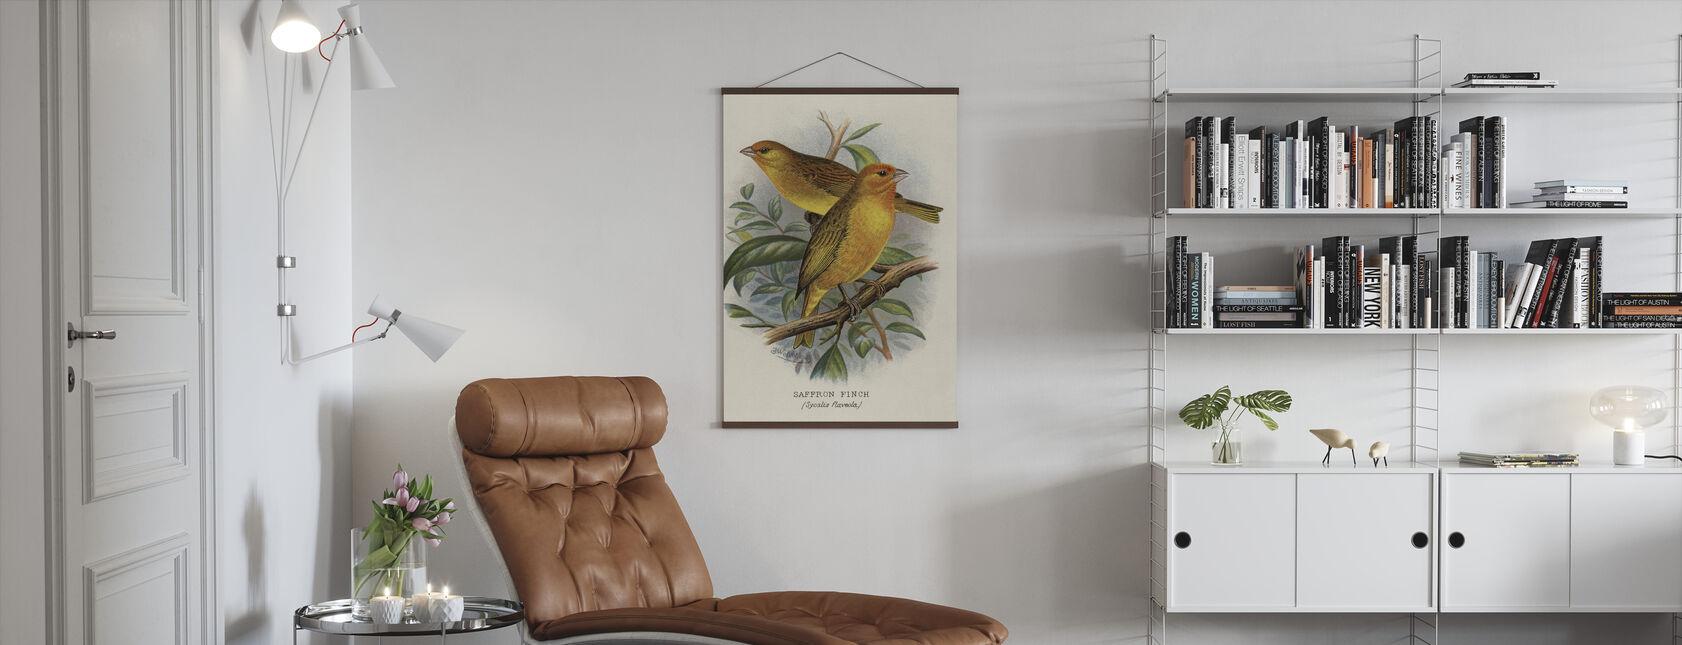 Saffron Finch - Frederick William Frohawk - Poster - Living Room